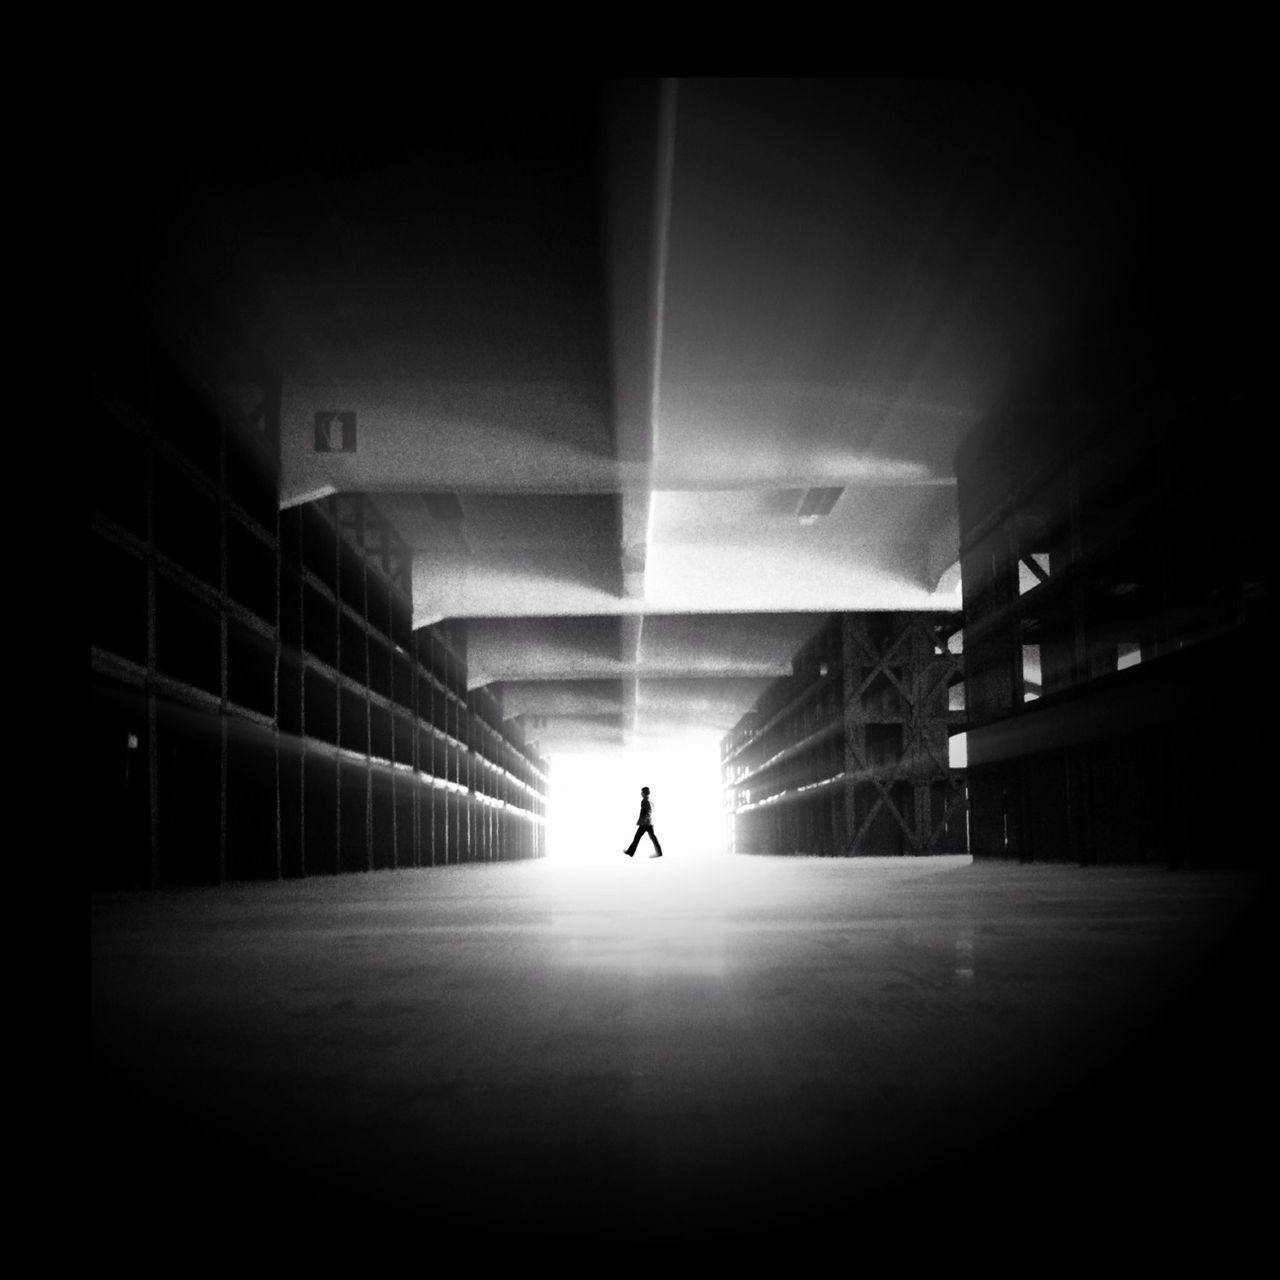 Side View Of Man Walking In Museum